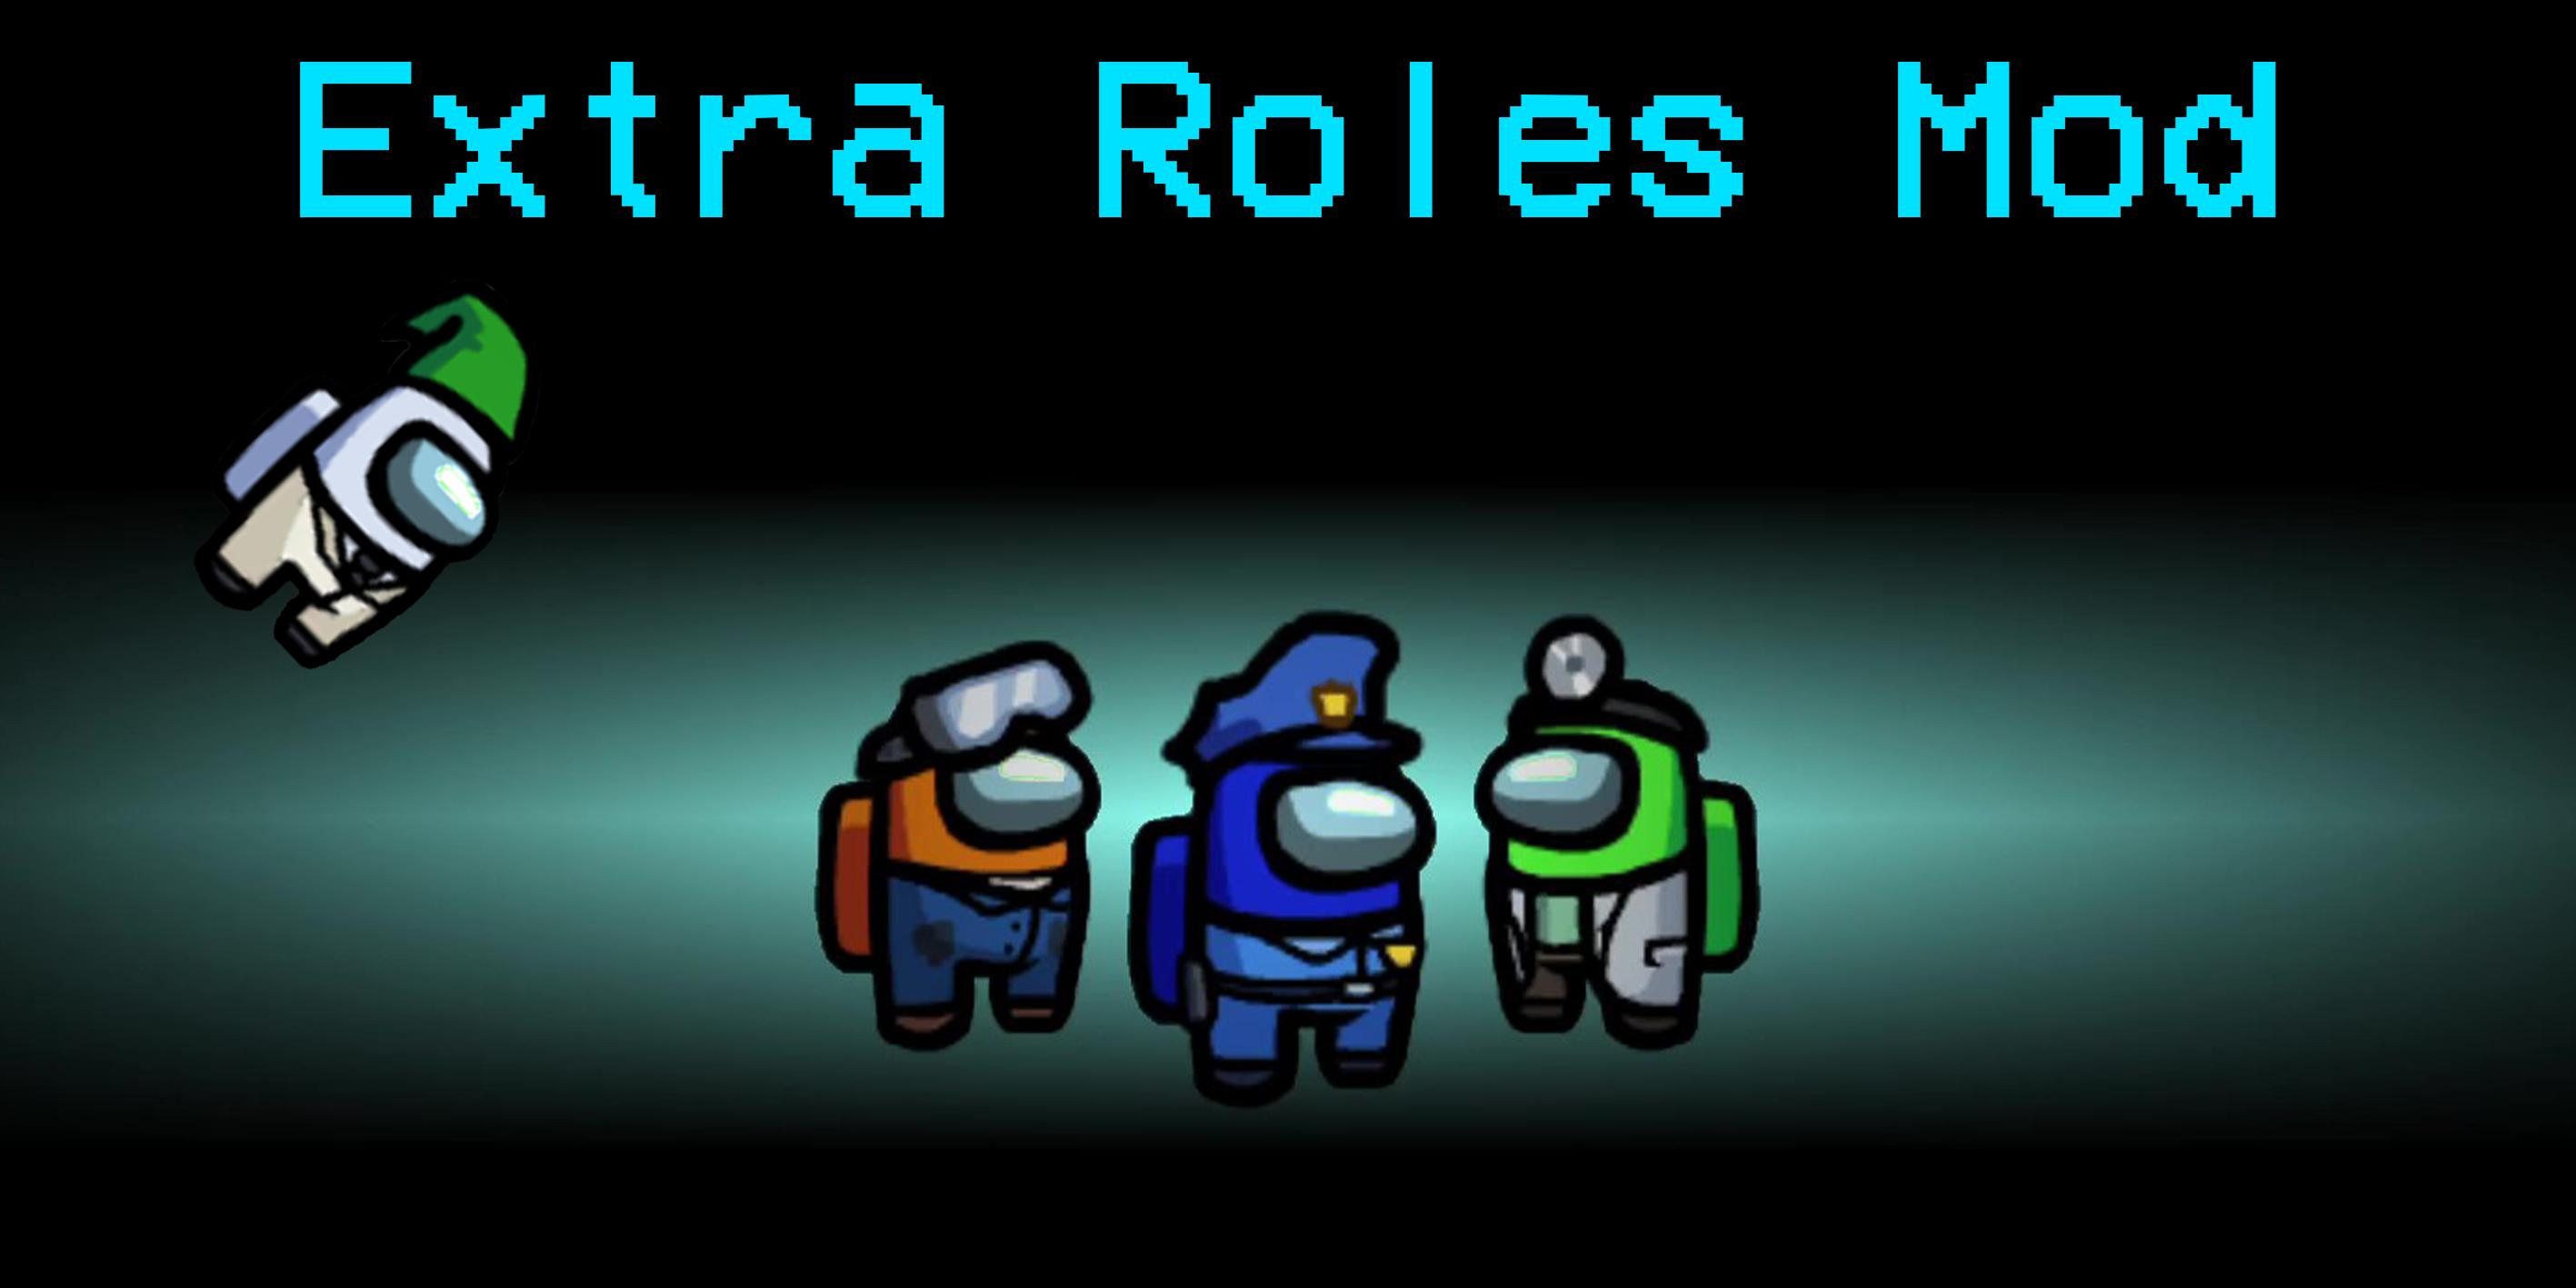 NotHunter101/ExtraRolesAmongUs - Download NotHunter101/ExtraRolesAmongUs for FREE - Free Cheats for Games